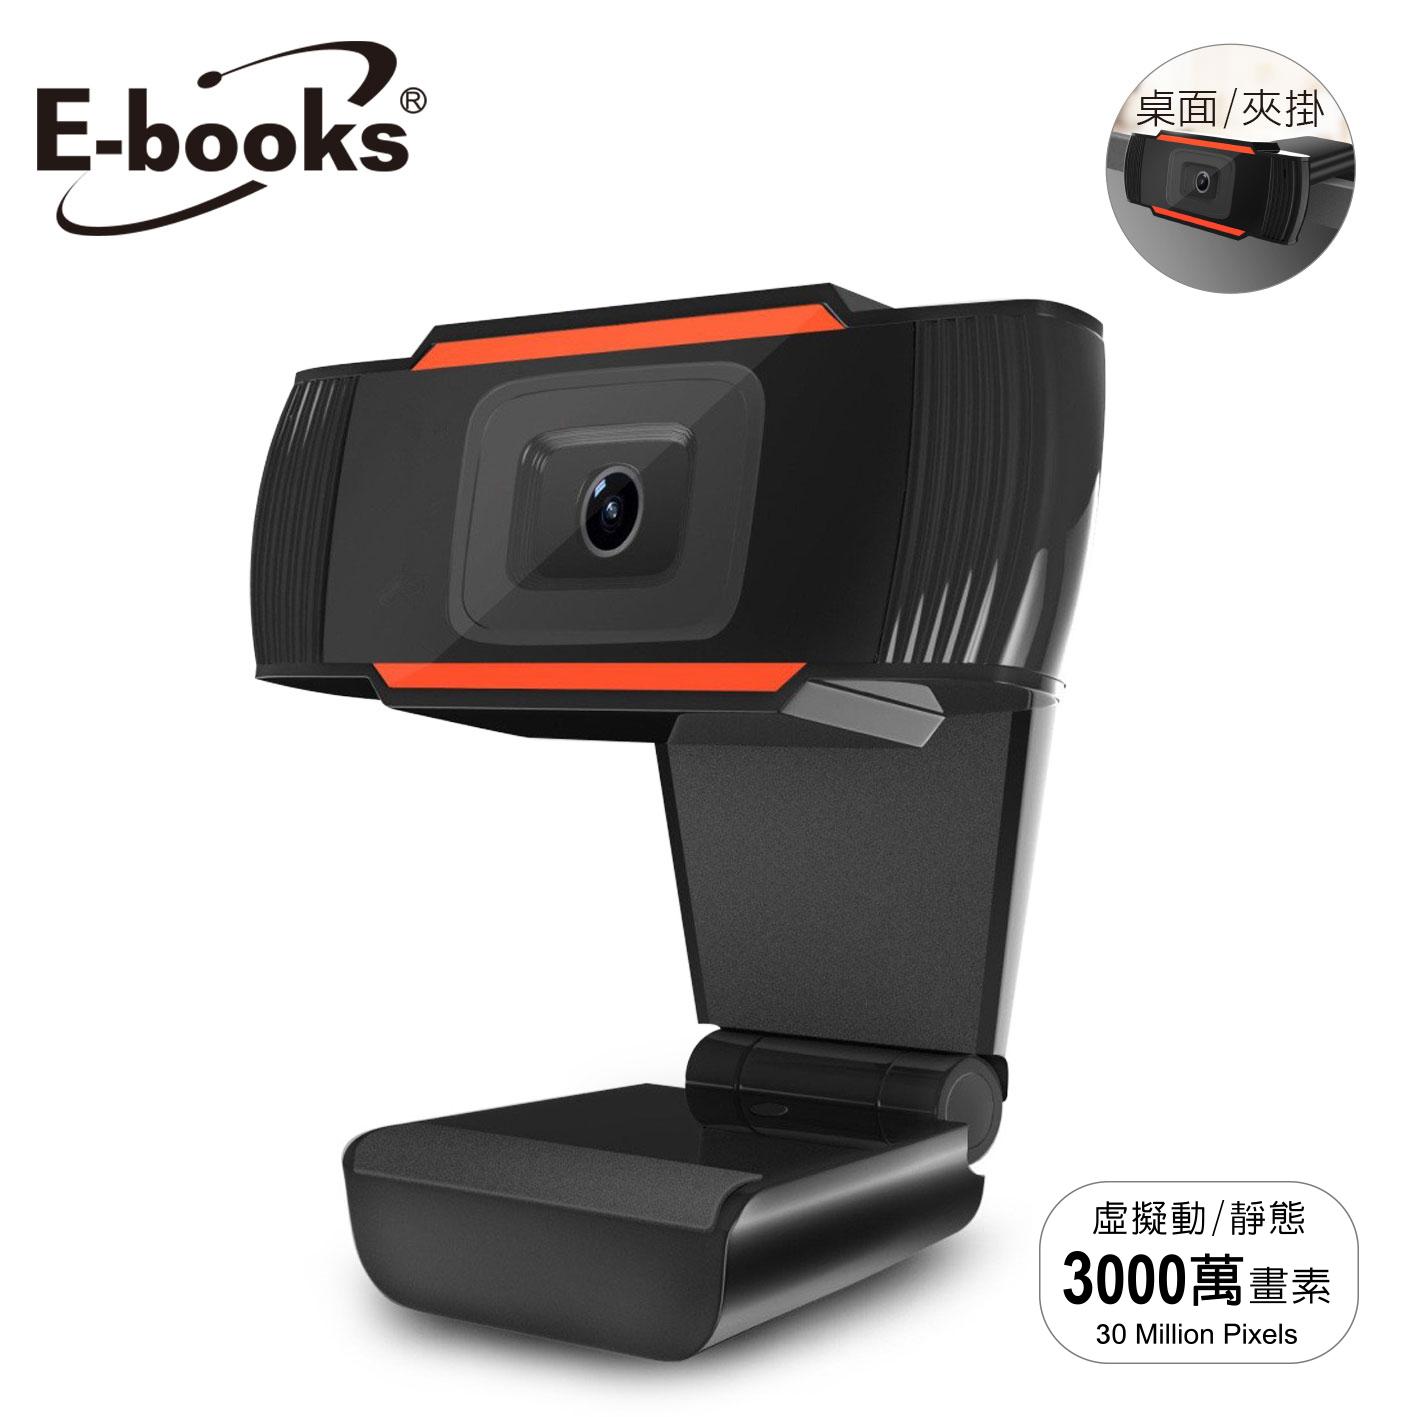 E-books W16高畫質隨插即用網路攝影機